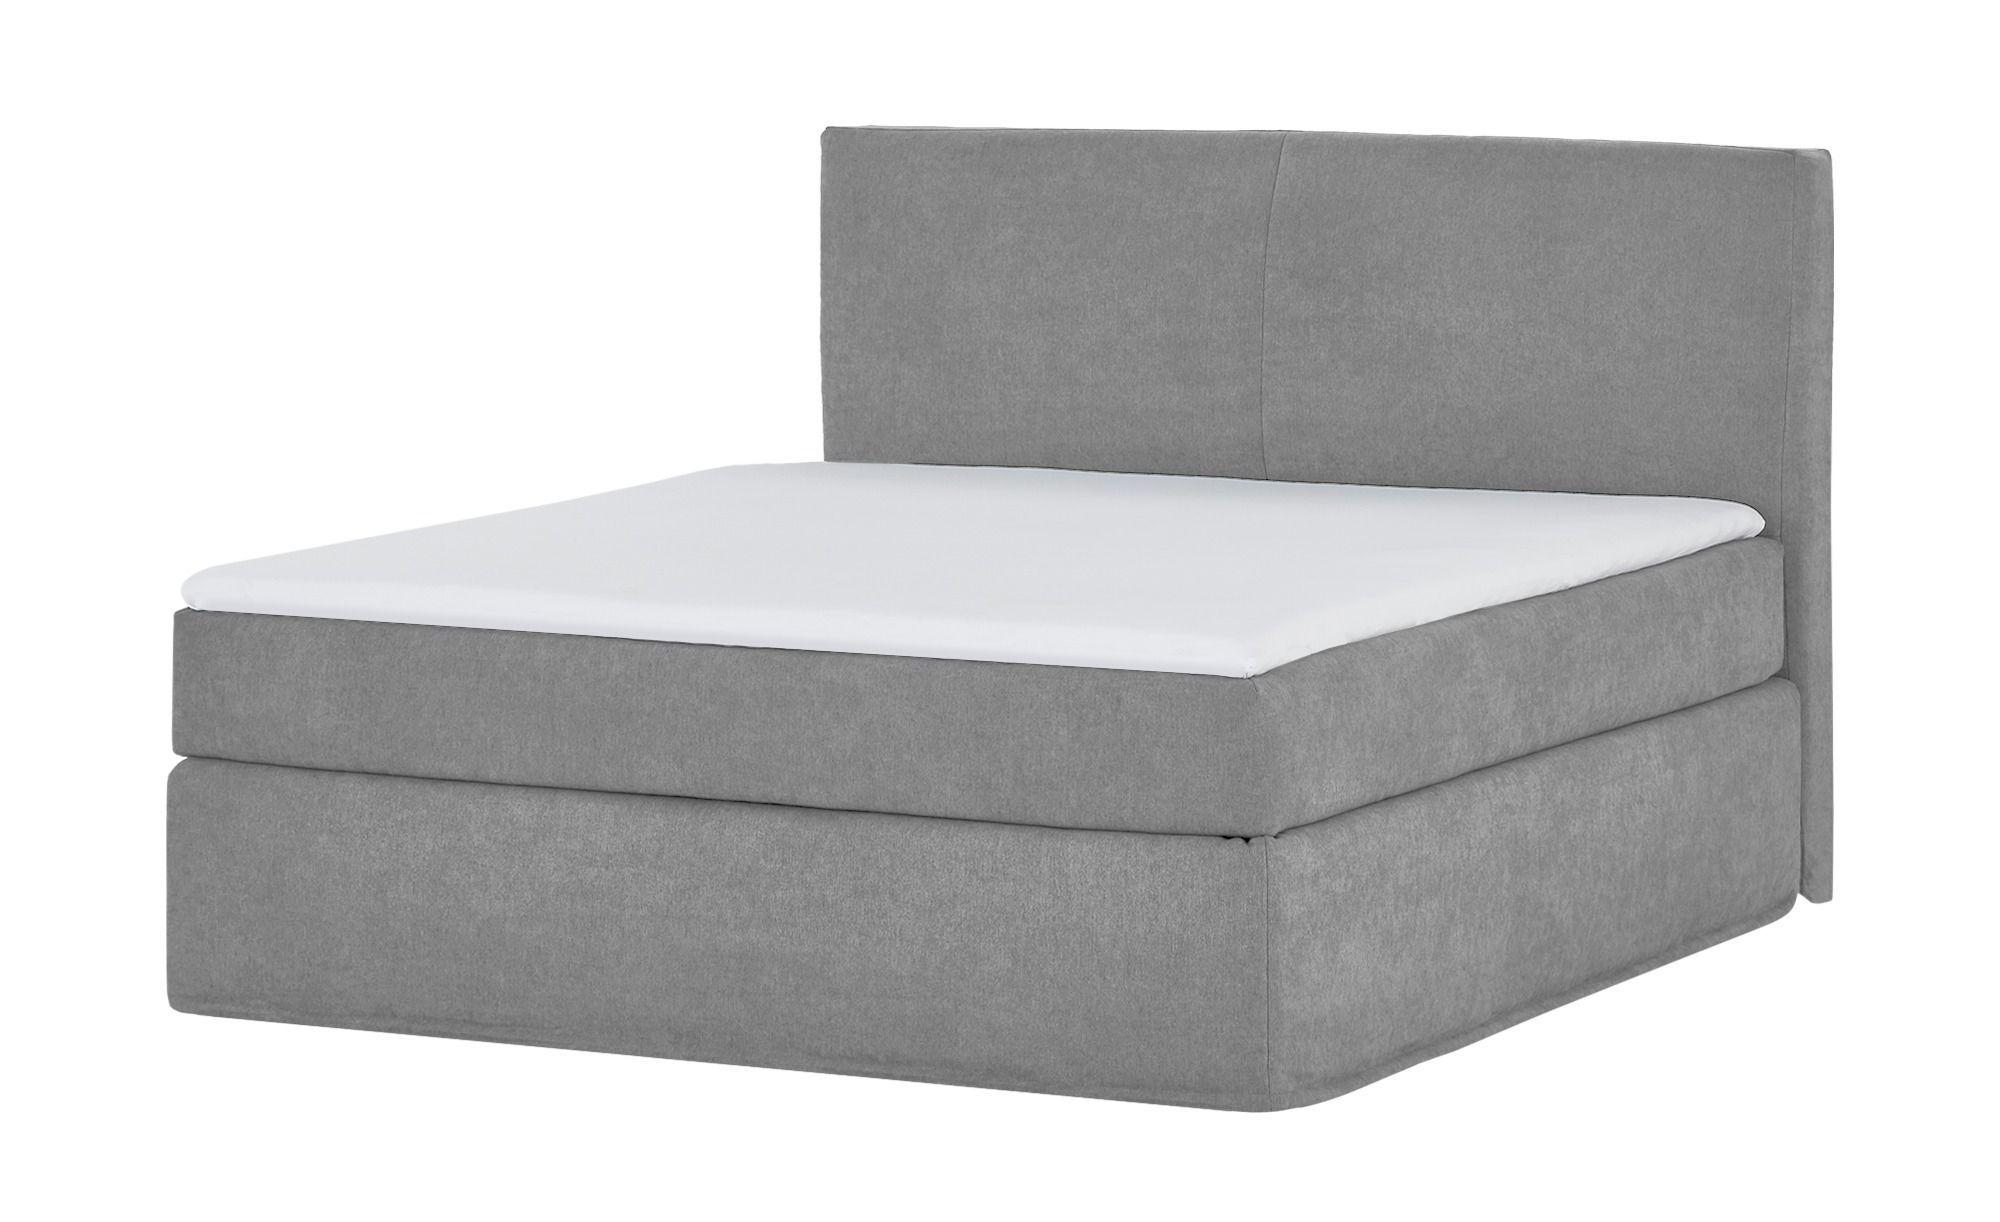 Boxi Box Spring Bed Found At Mobel Hoffner Boxi Box Spring Bed